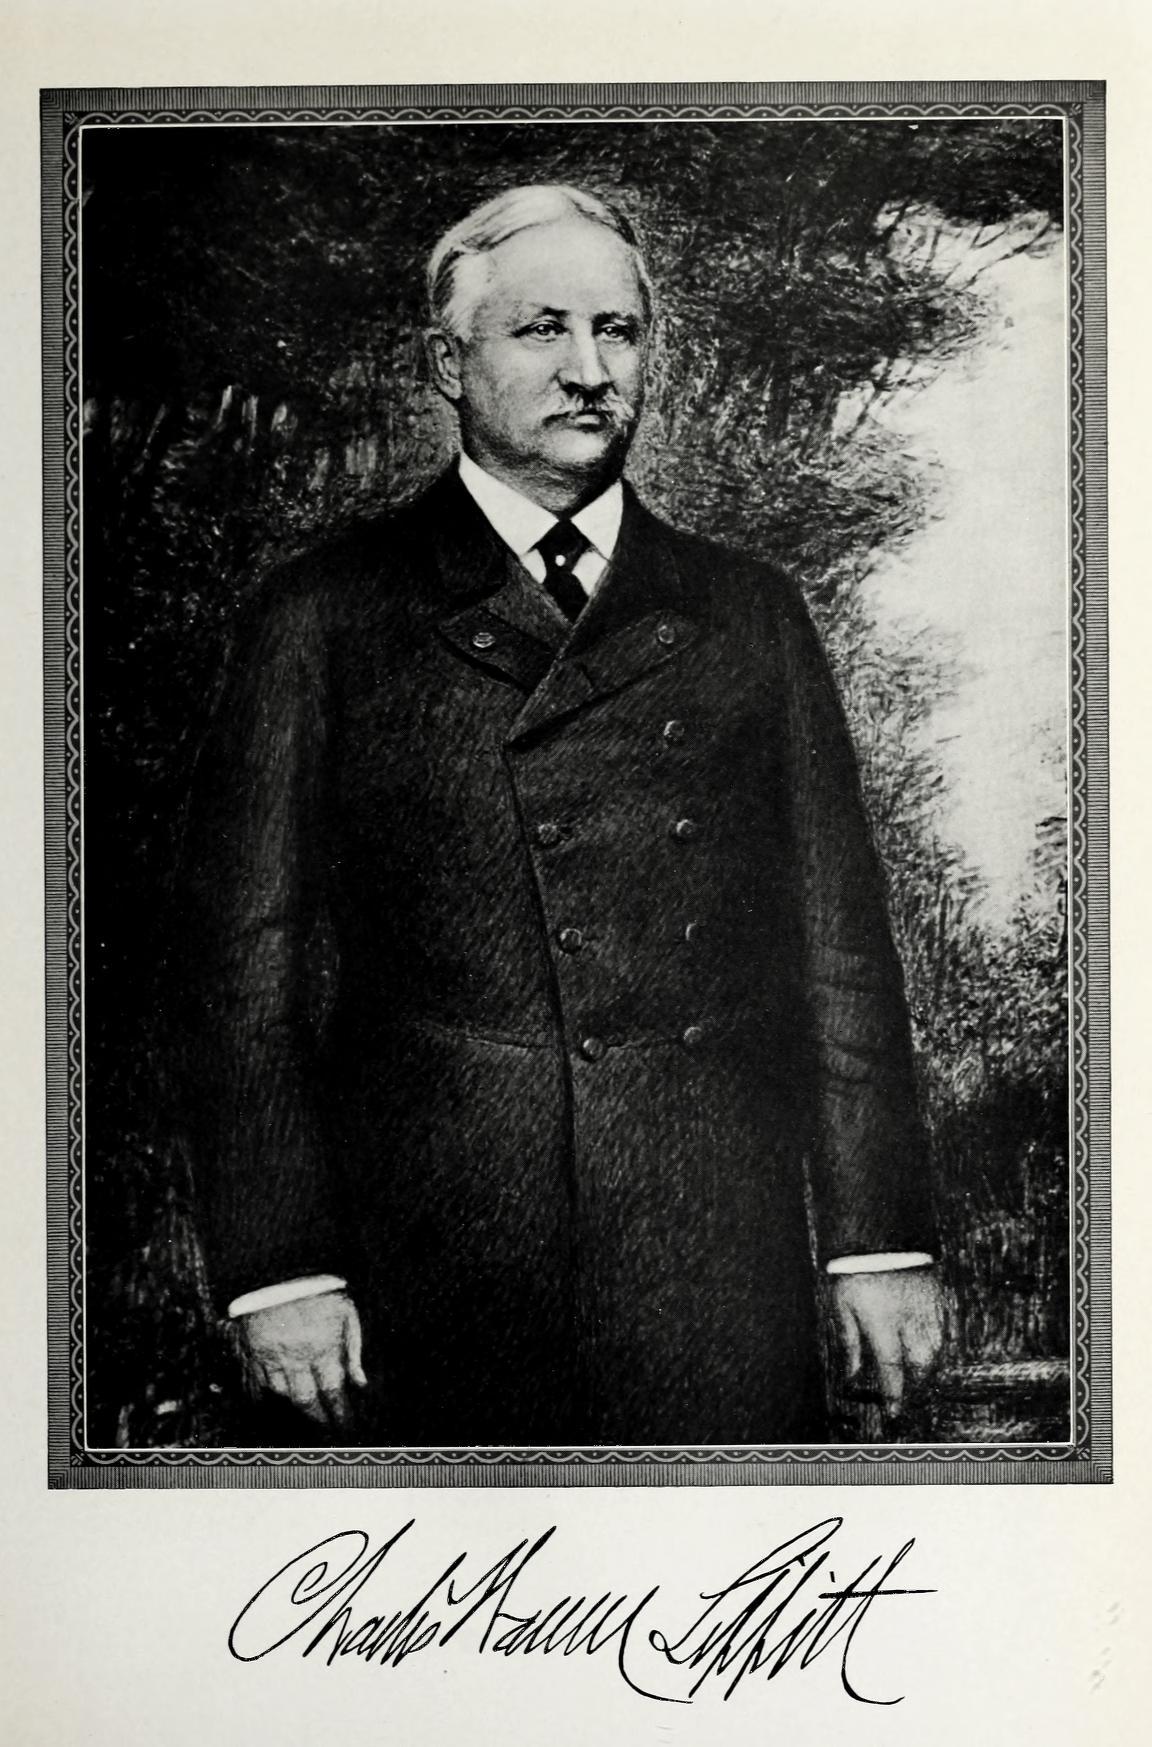 Charles Warren Lippitt